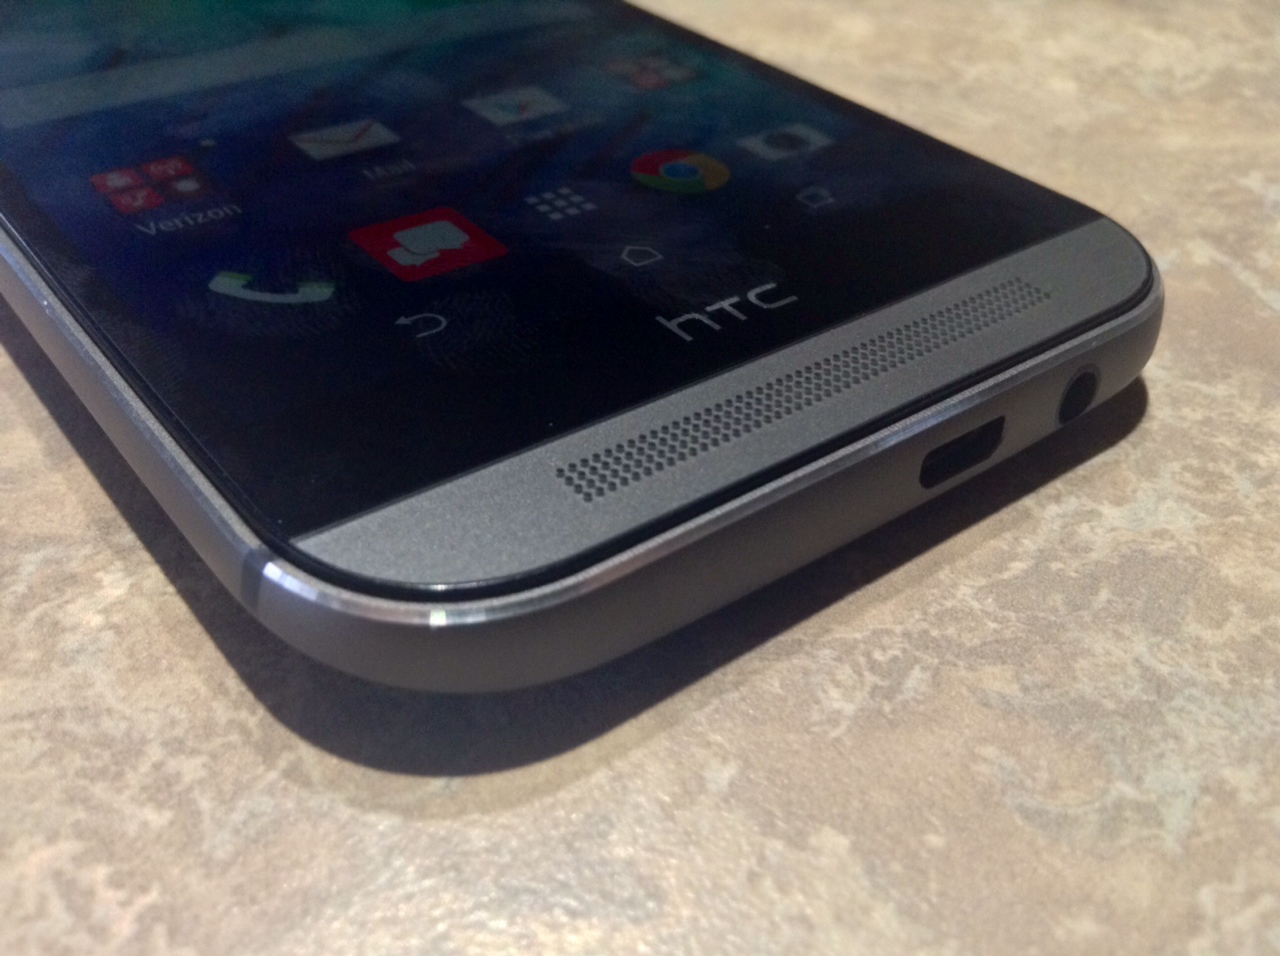 HTC One M8 build